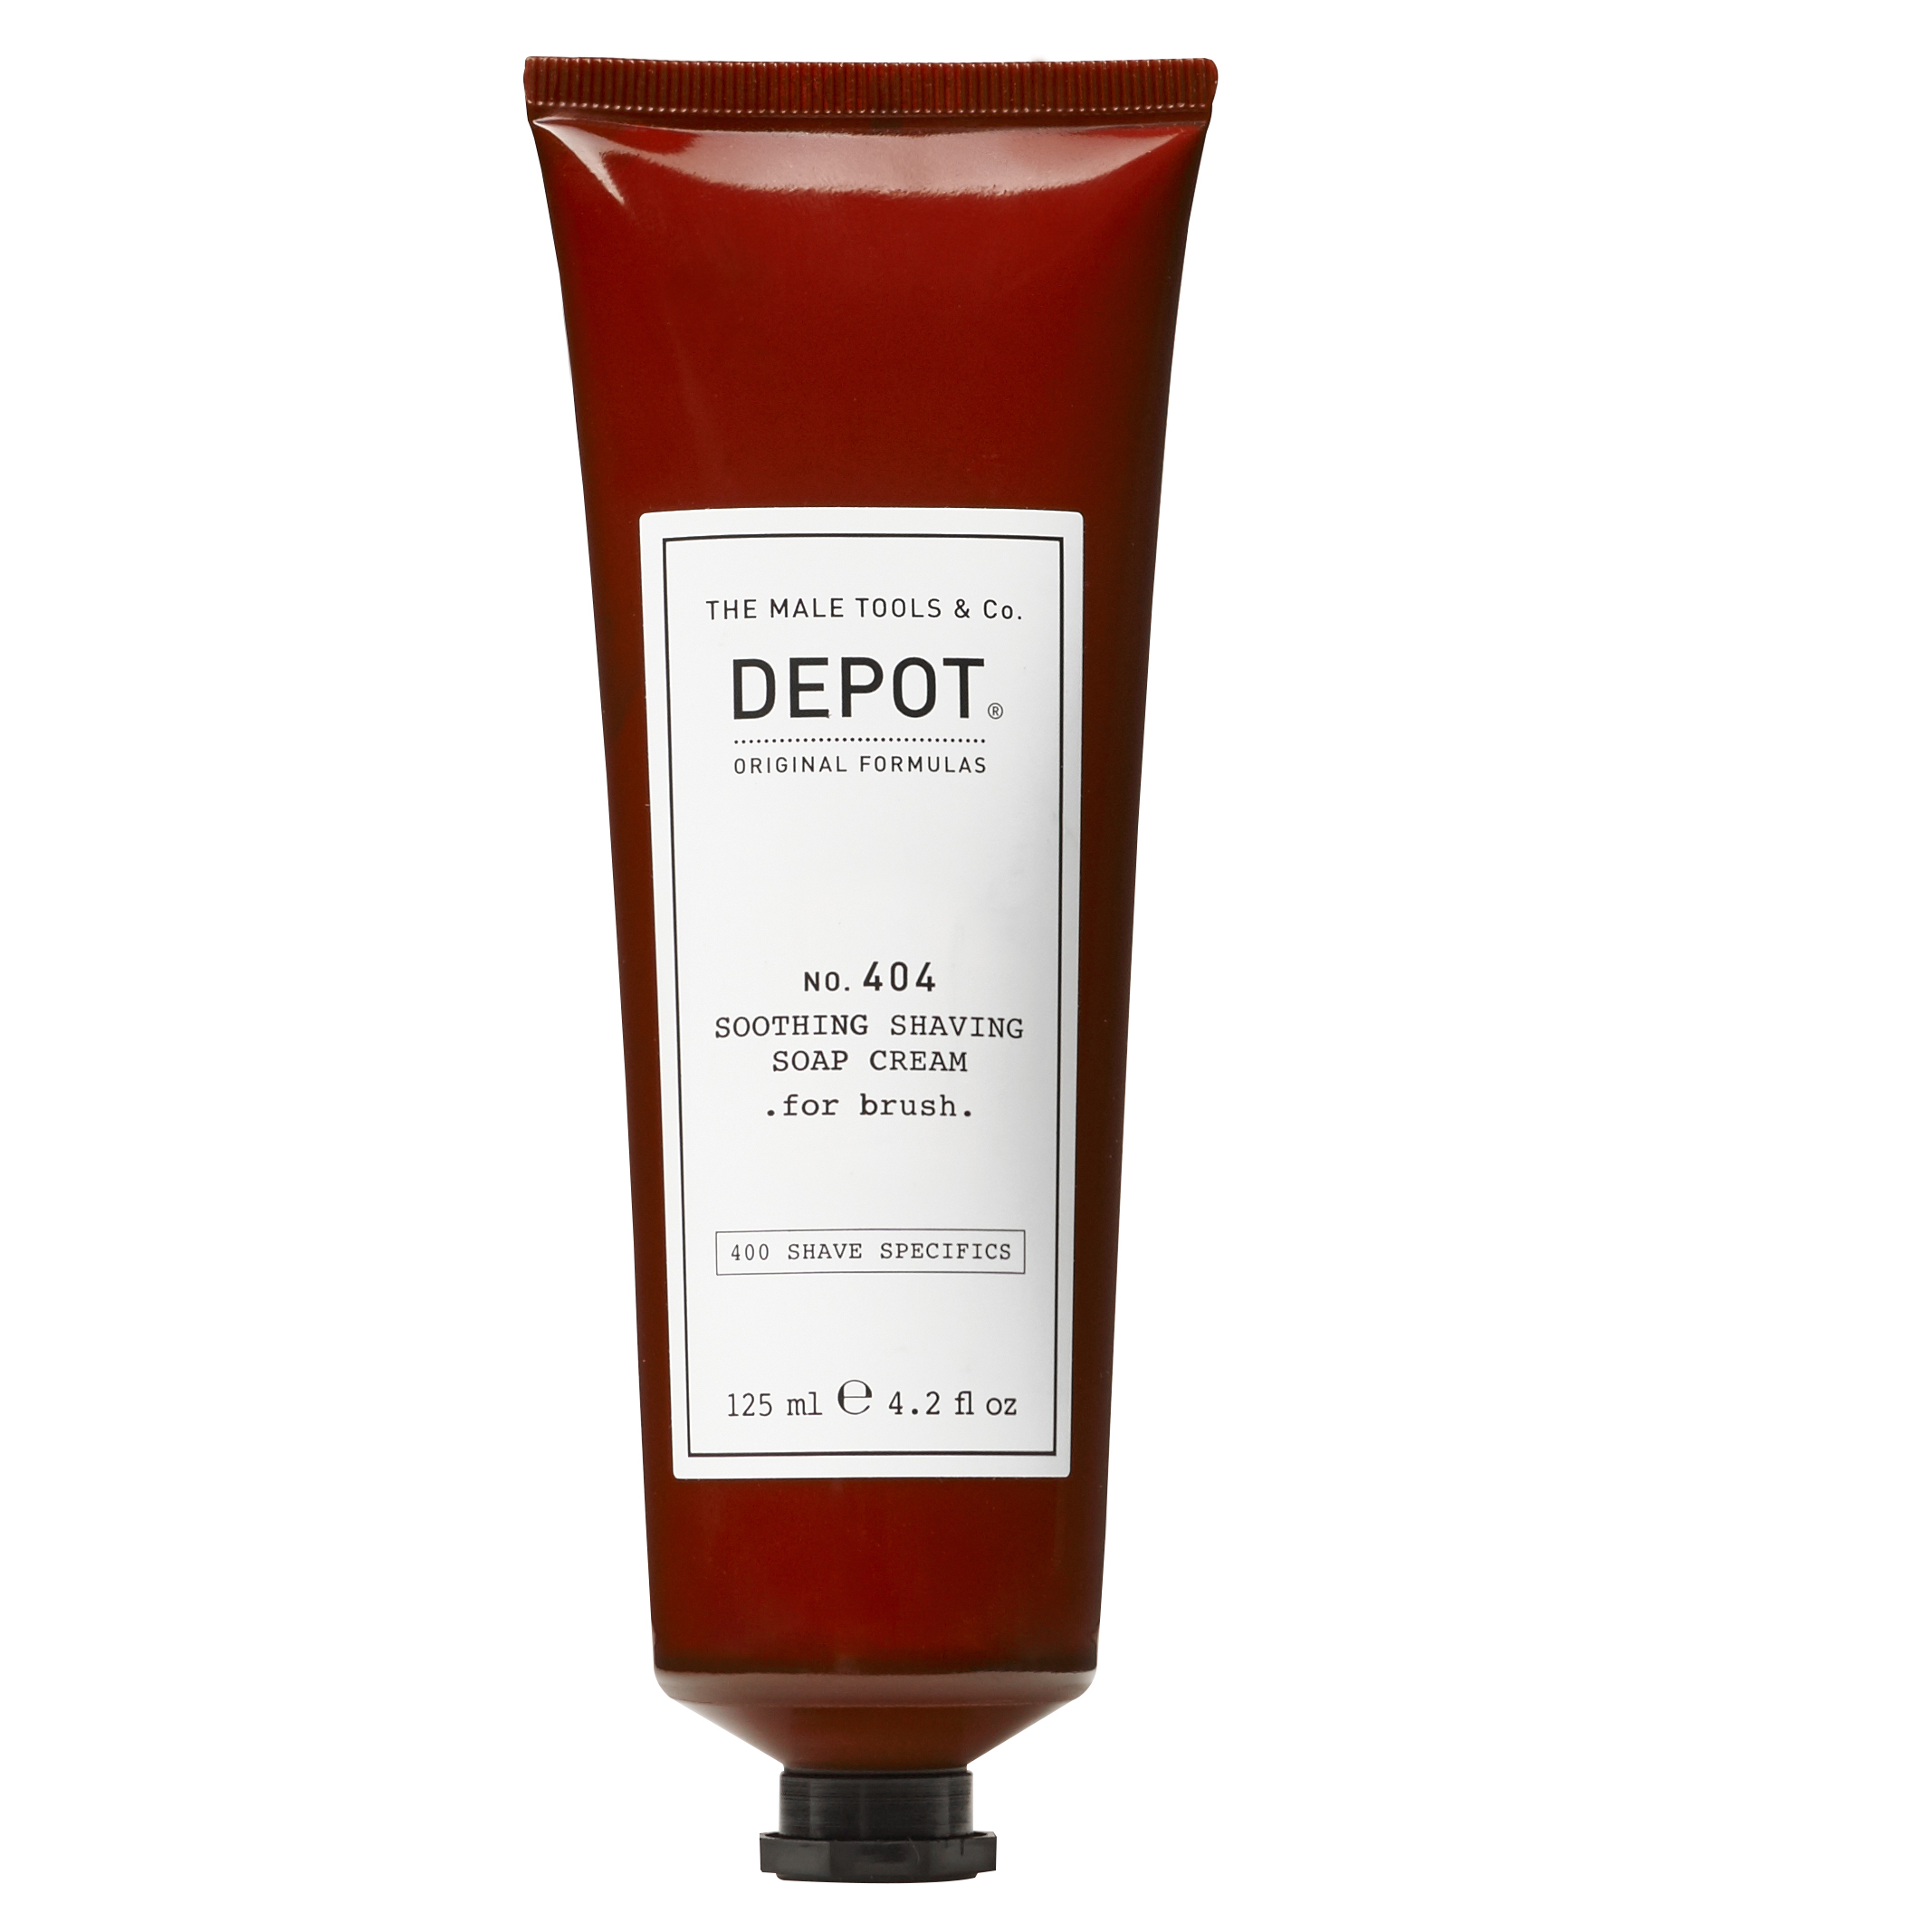 Depot - No. 404 Soothing Shaving Soap Cream for Brush 125 ml